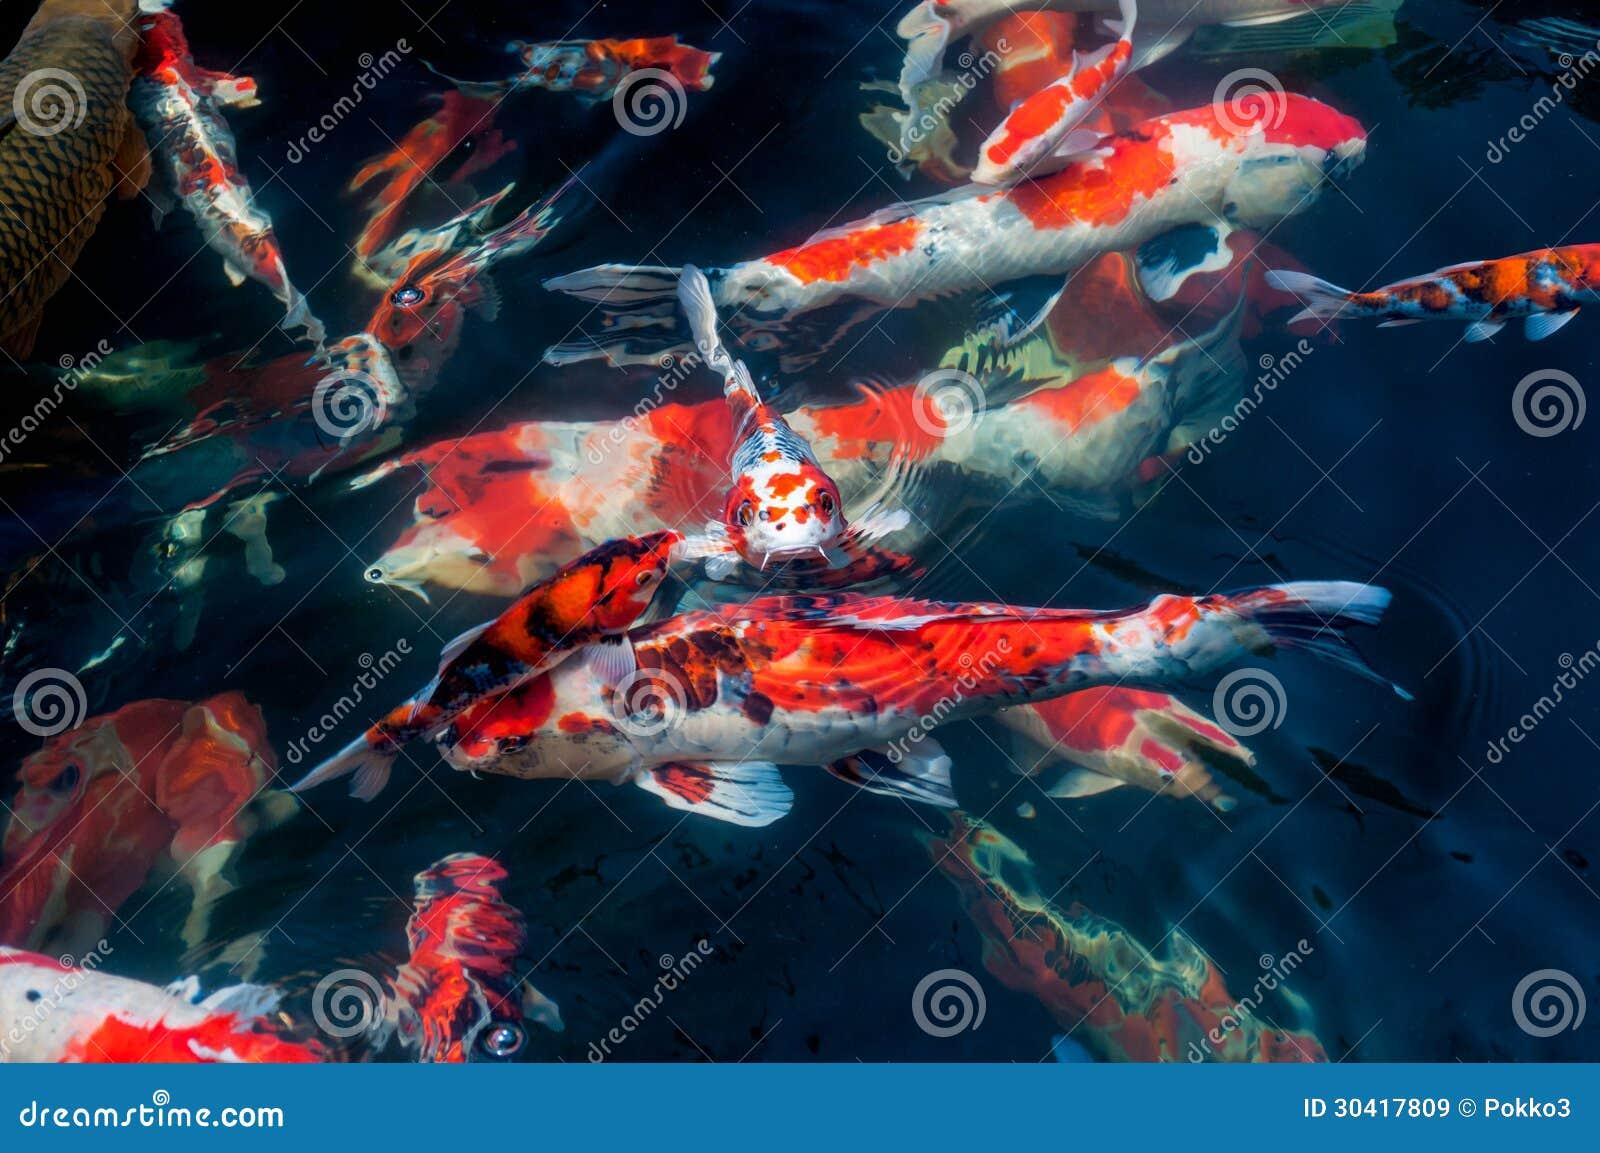 Beautiful koi fish royalty free stock images image 30417809 for Beautiful koi fish